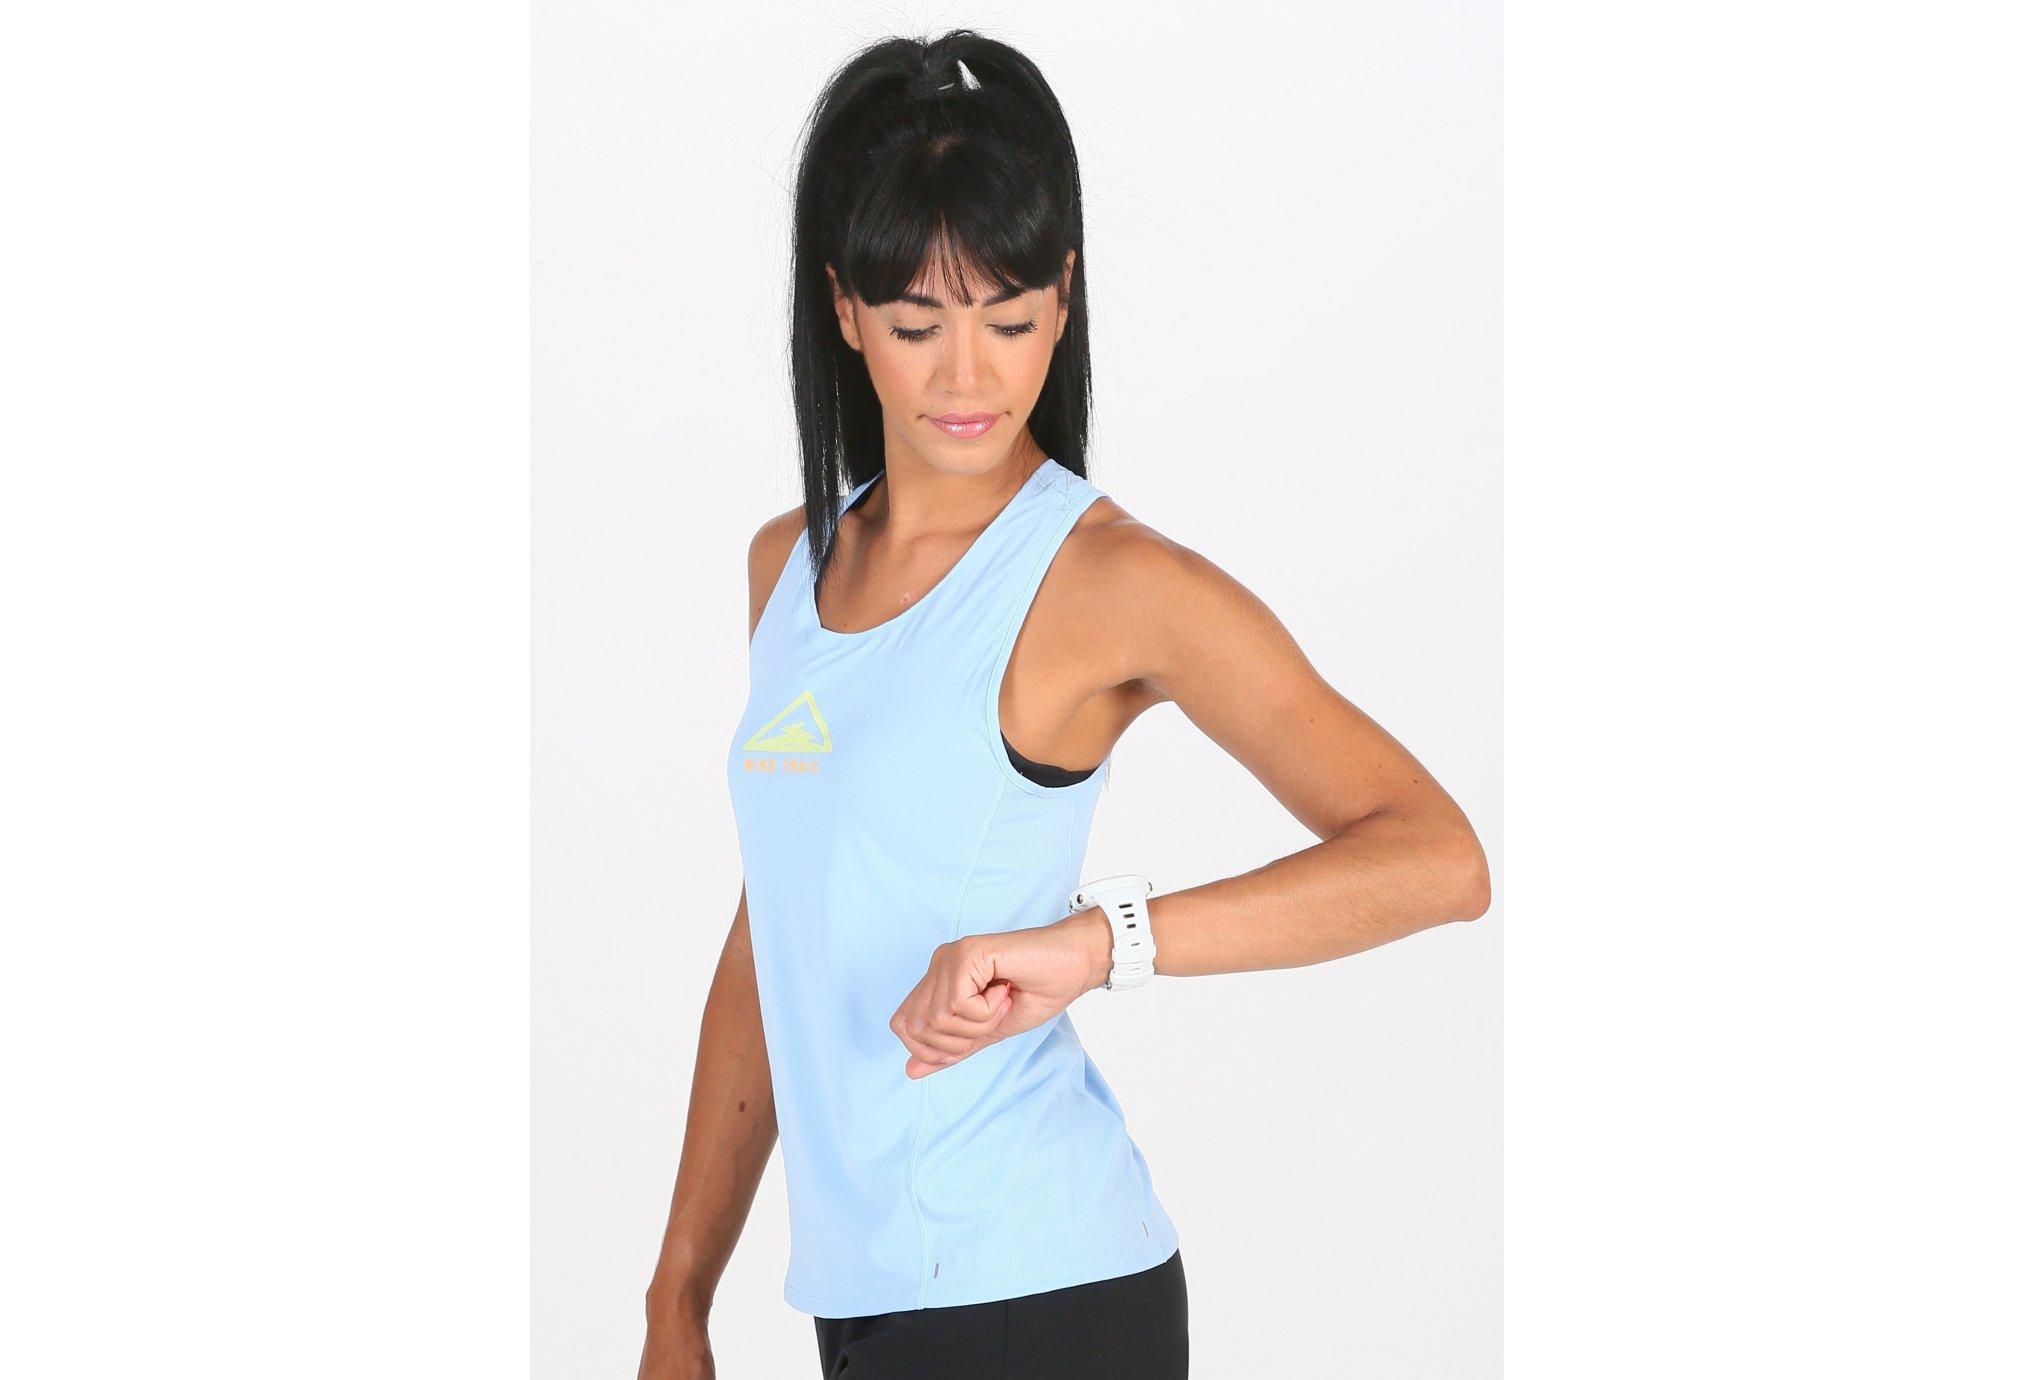 Nike City Sleek Trail W vêtement running femme